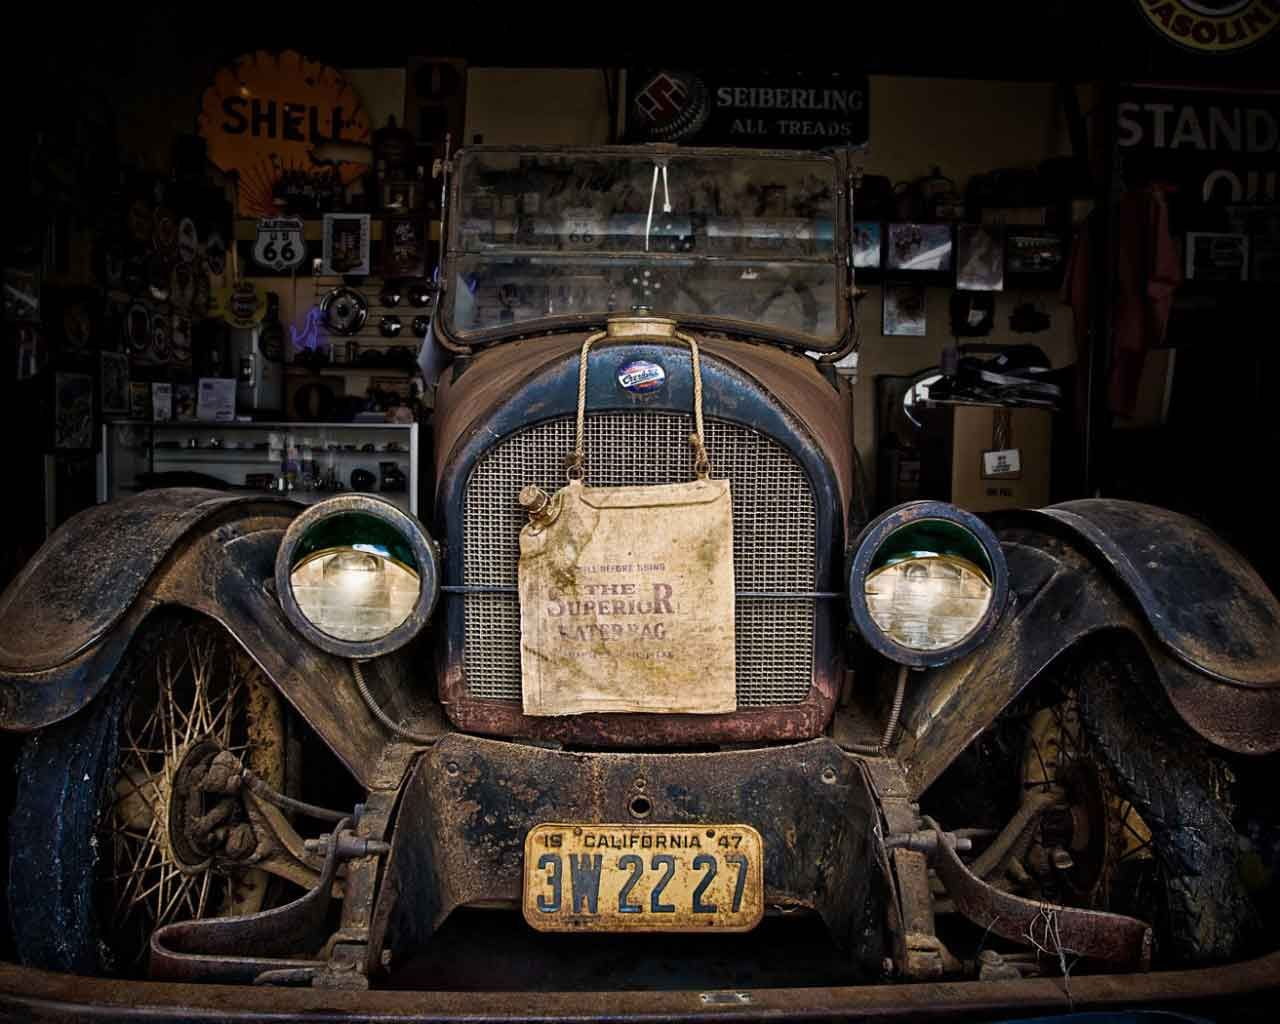 Fotos-autos-de-coleccion-carros-antiguos-retro-fondo